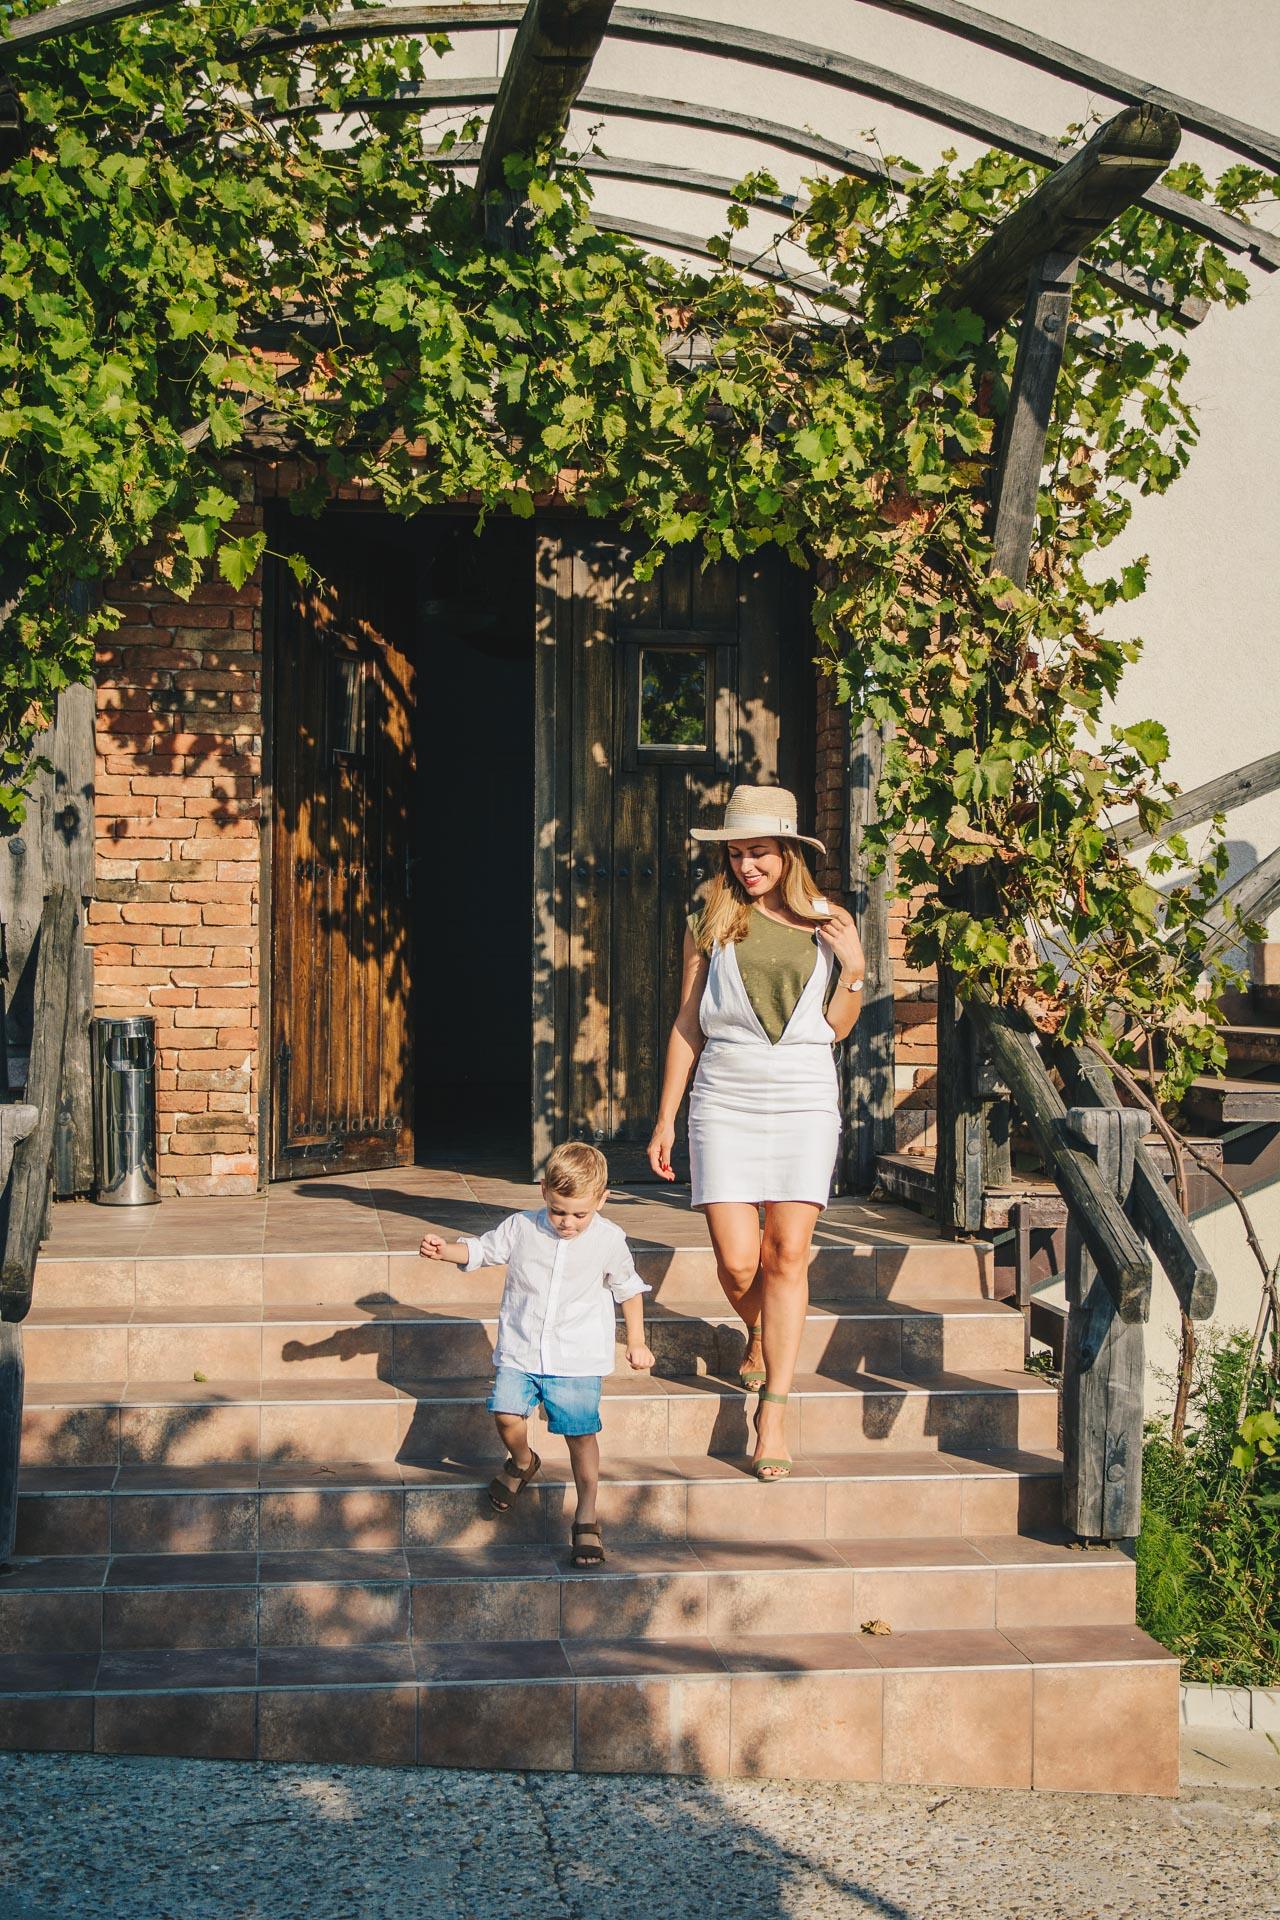 Family holiday at seven generation winery